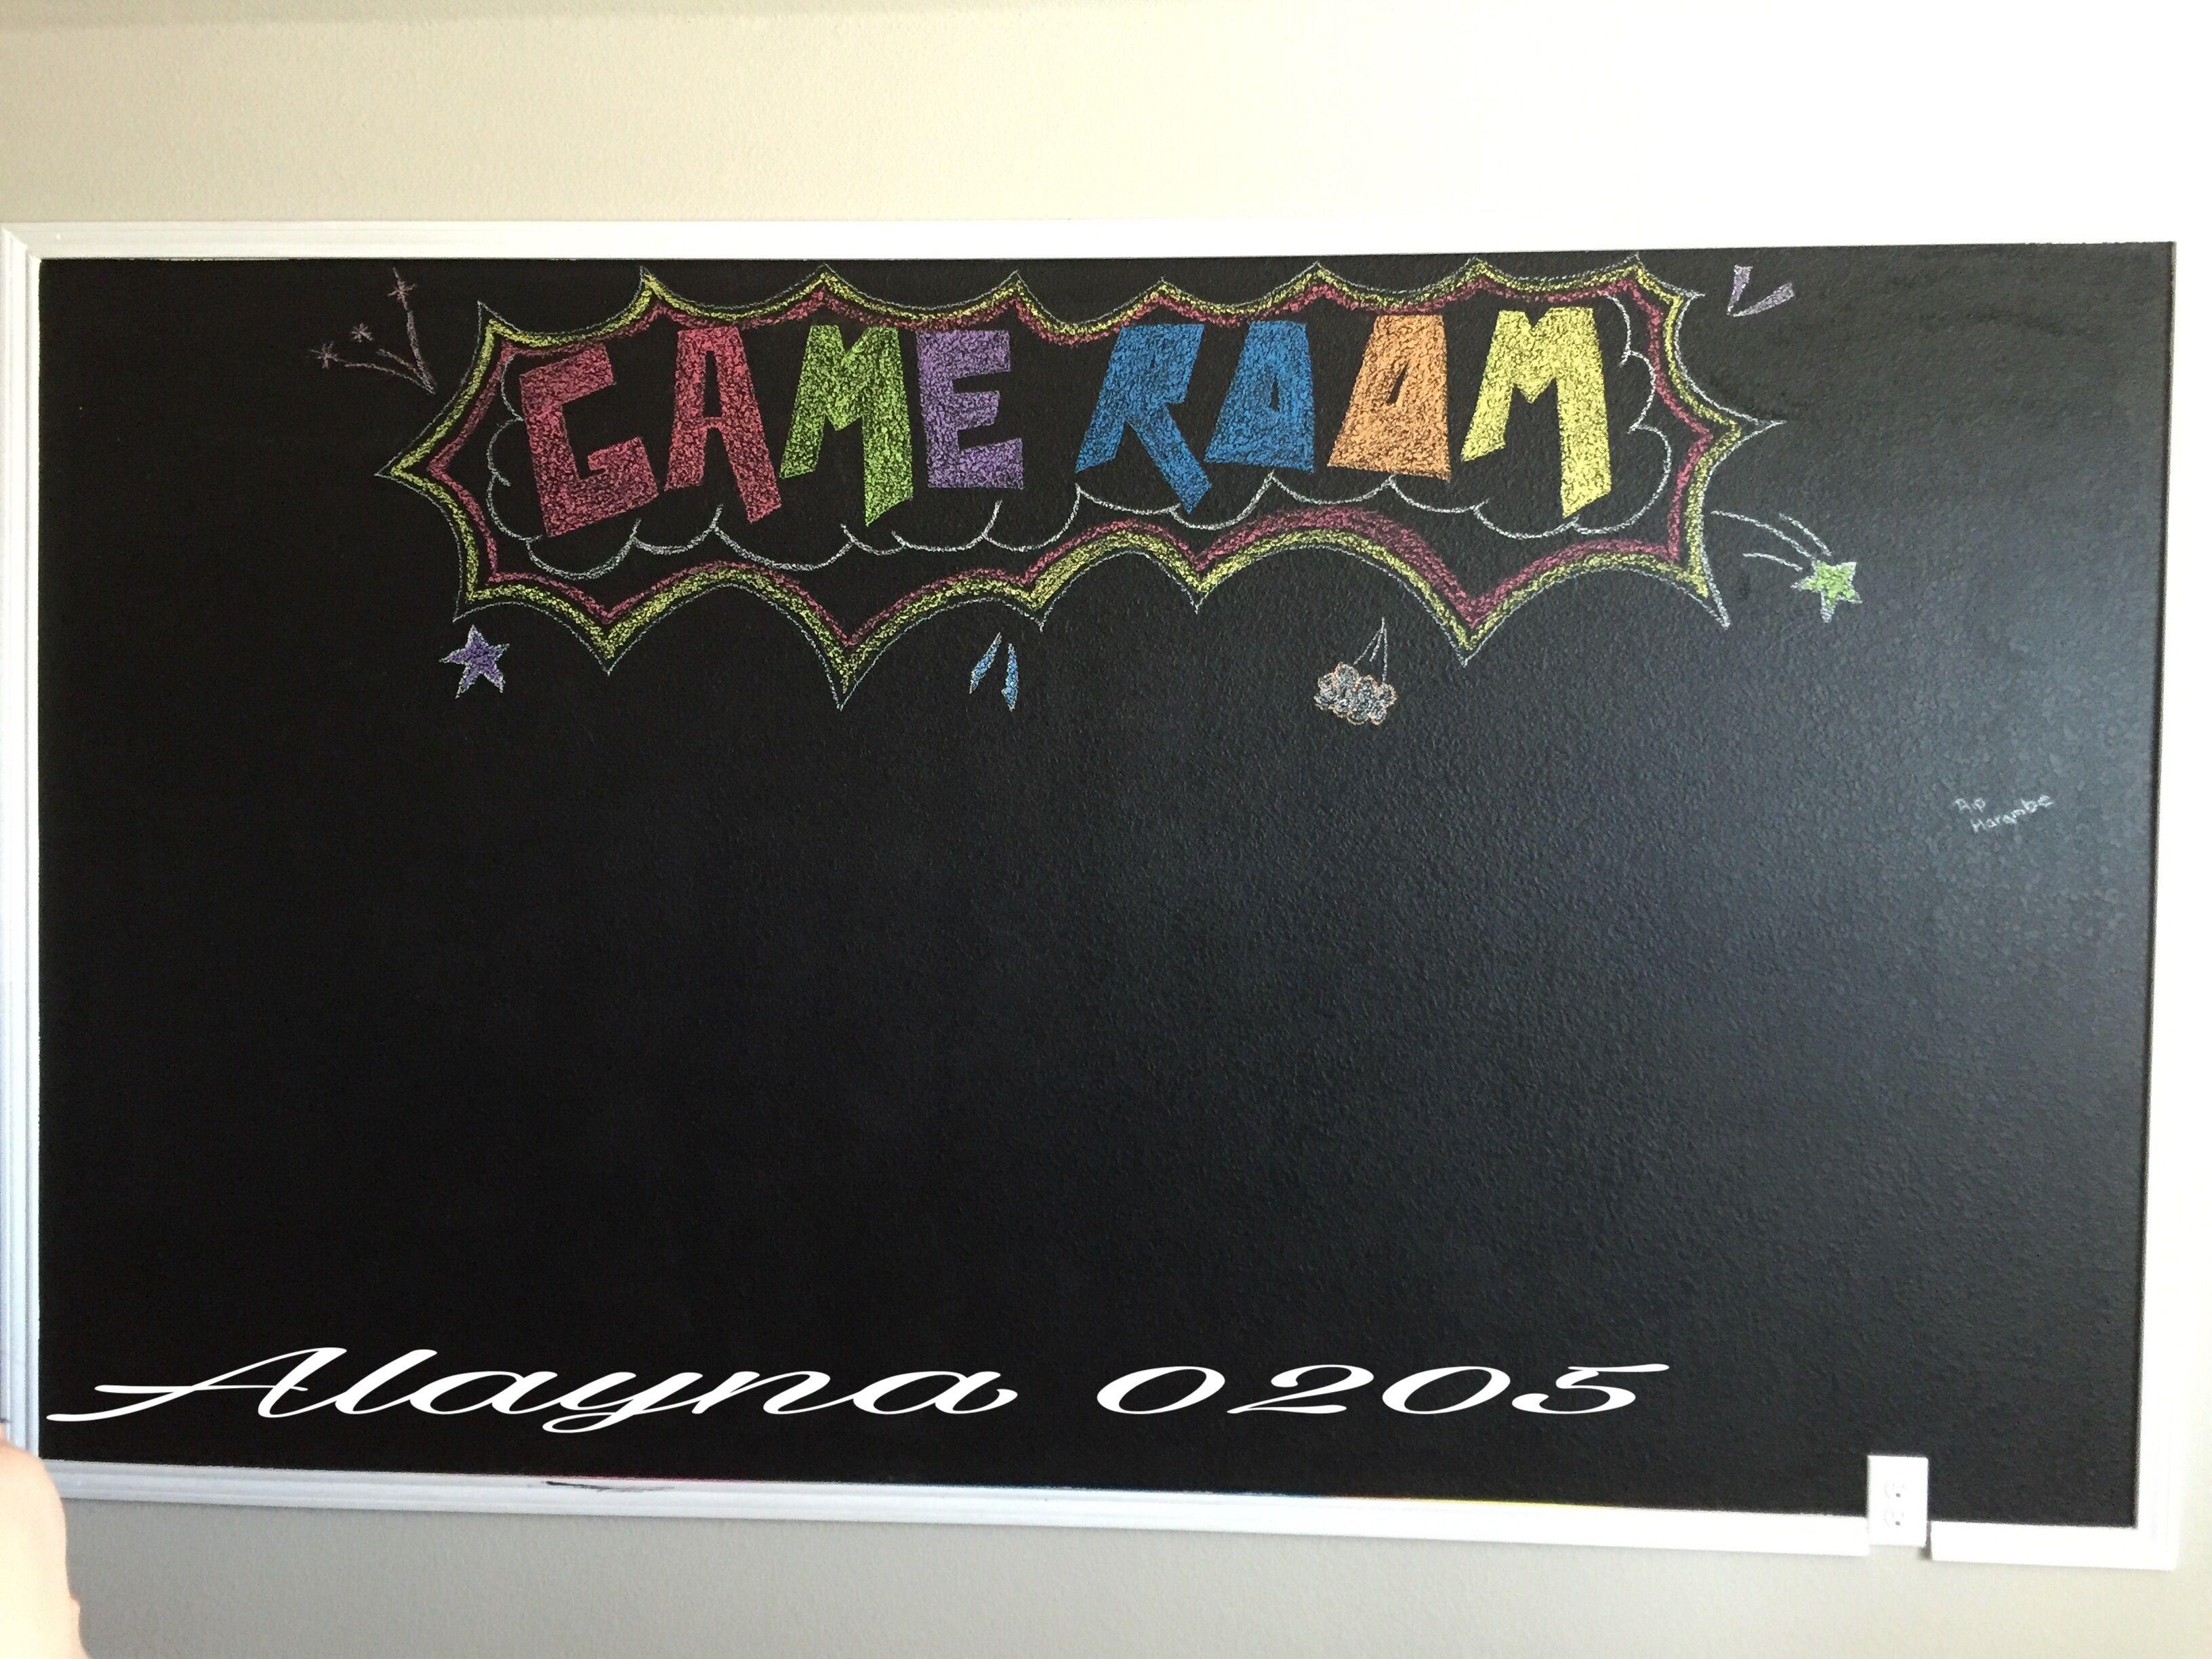 Chalkboard Paint Wall Idea Game Room Ideas Valspar Chalkboard Paint